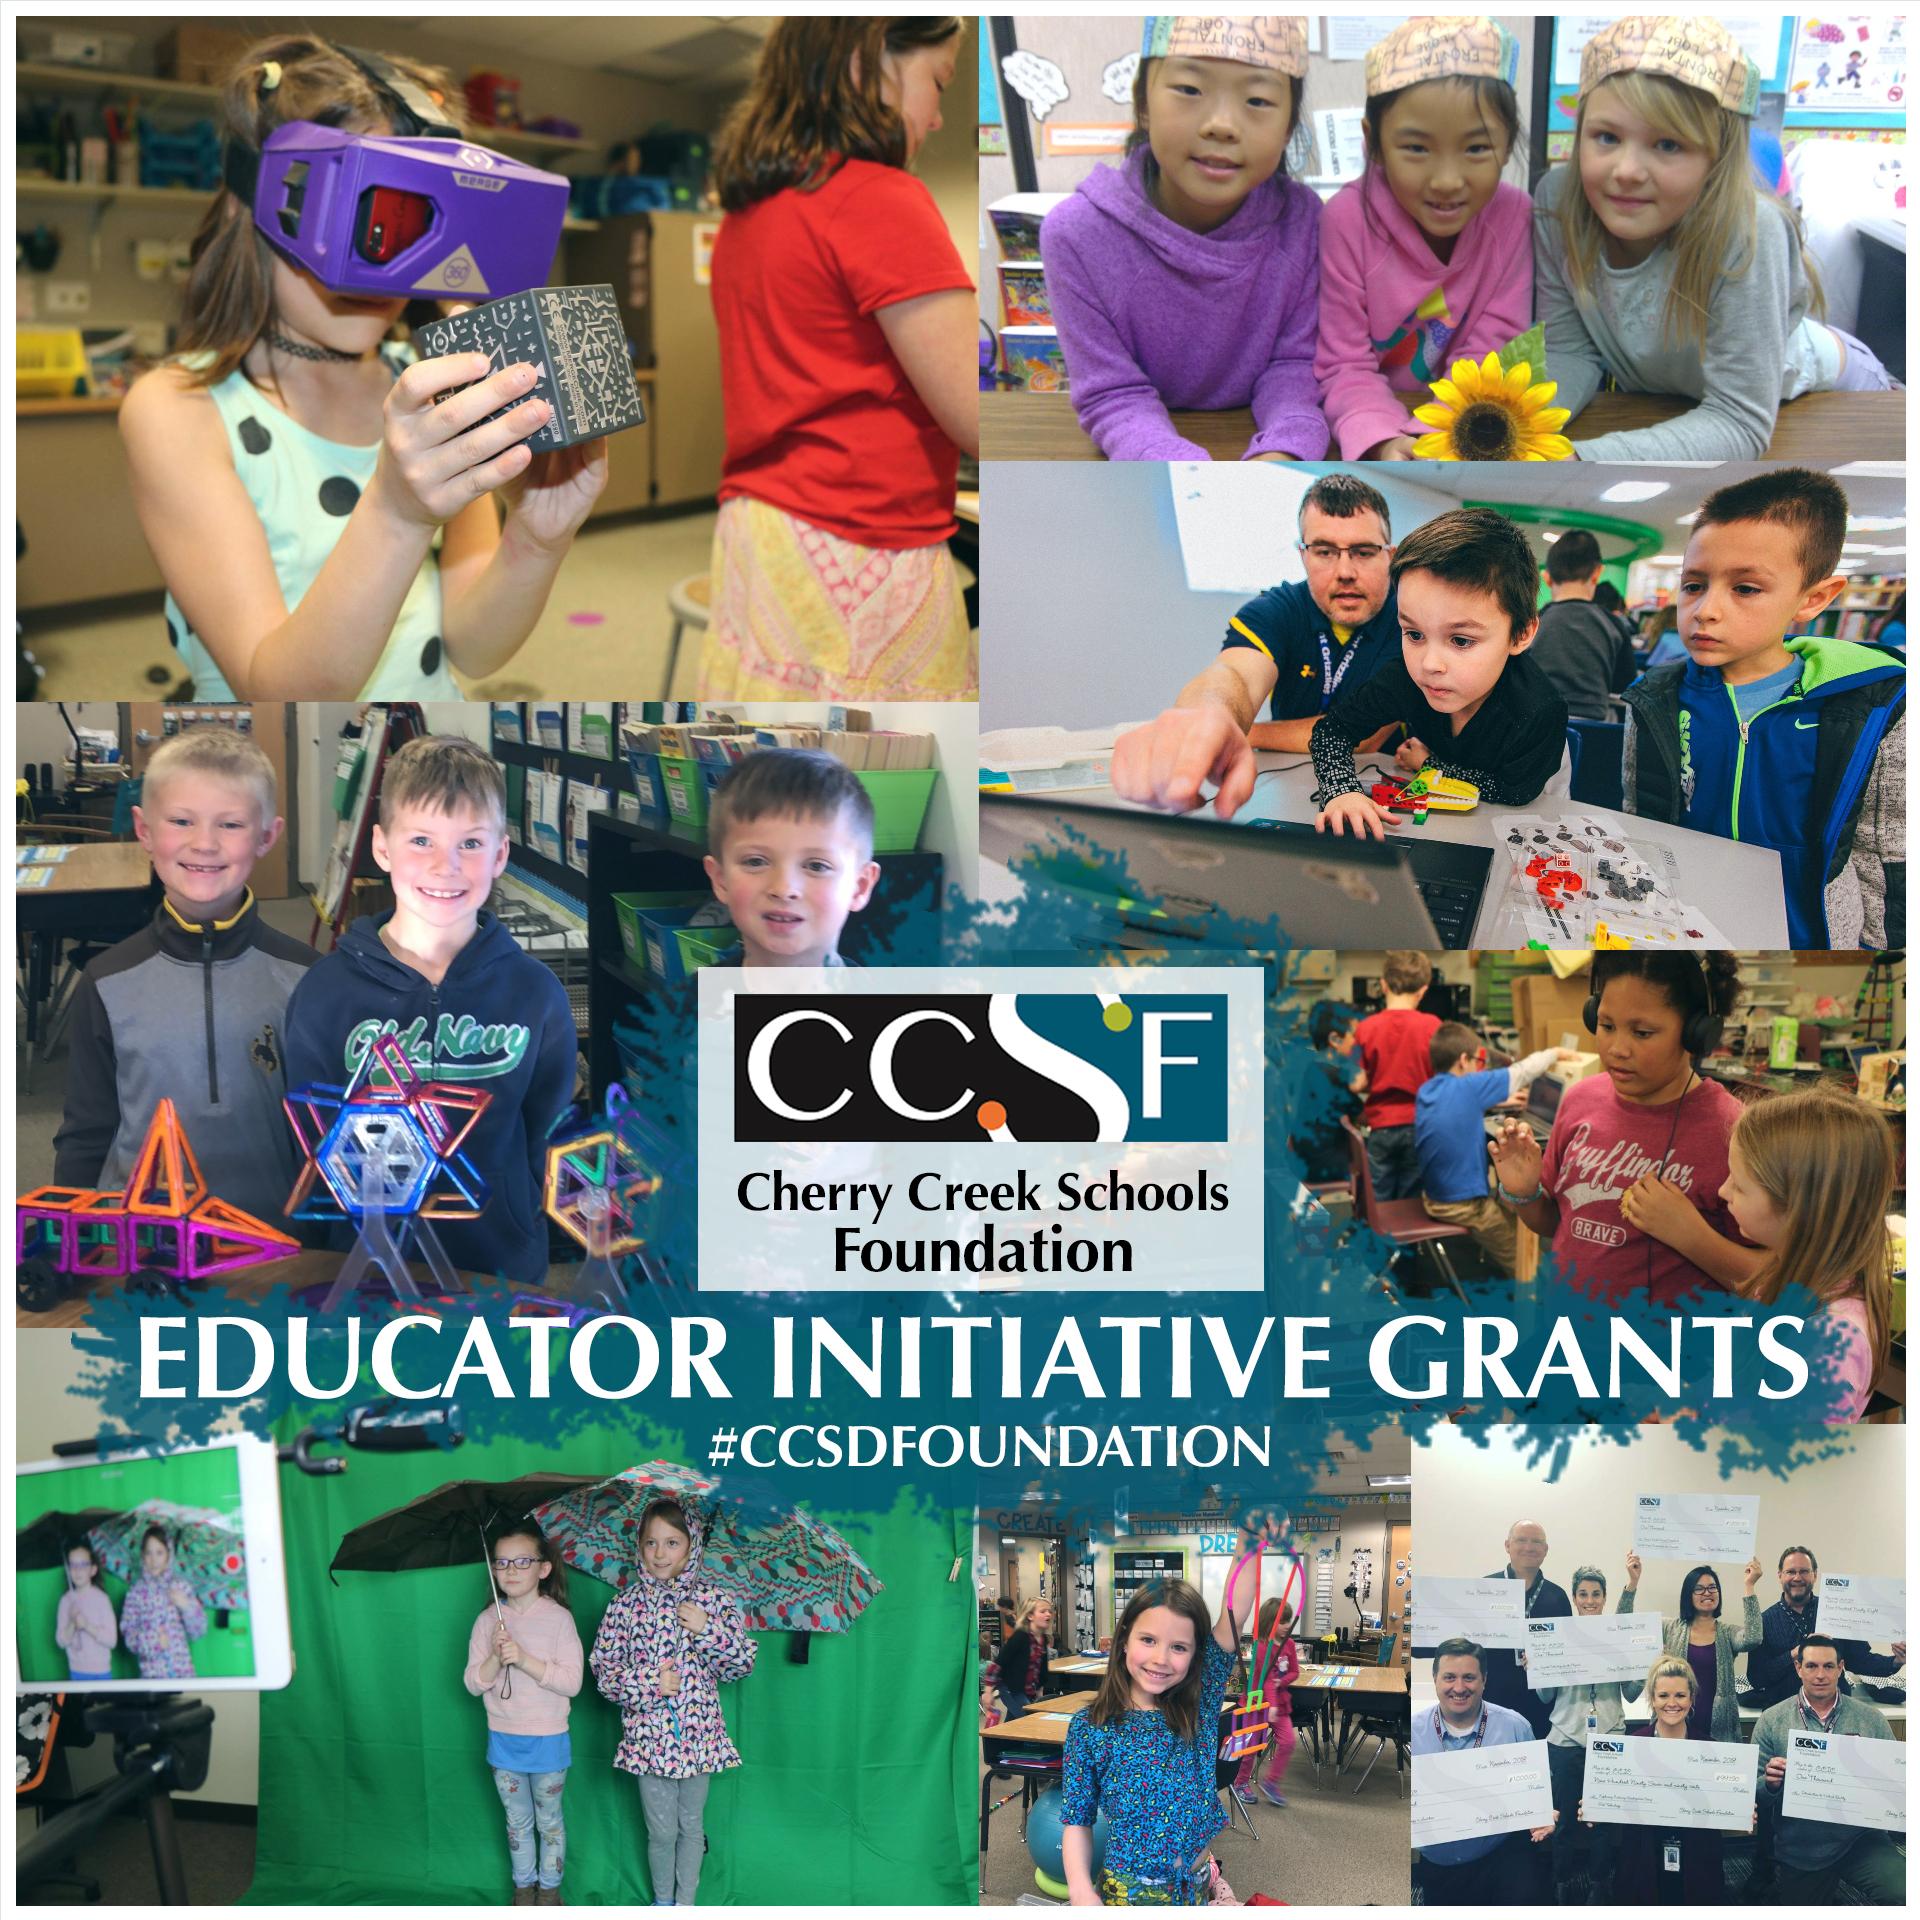 Educator Initiative Grants Announced!